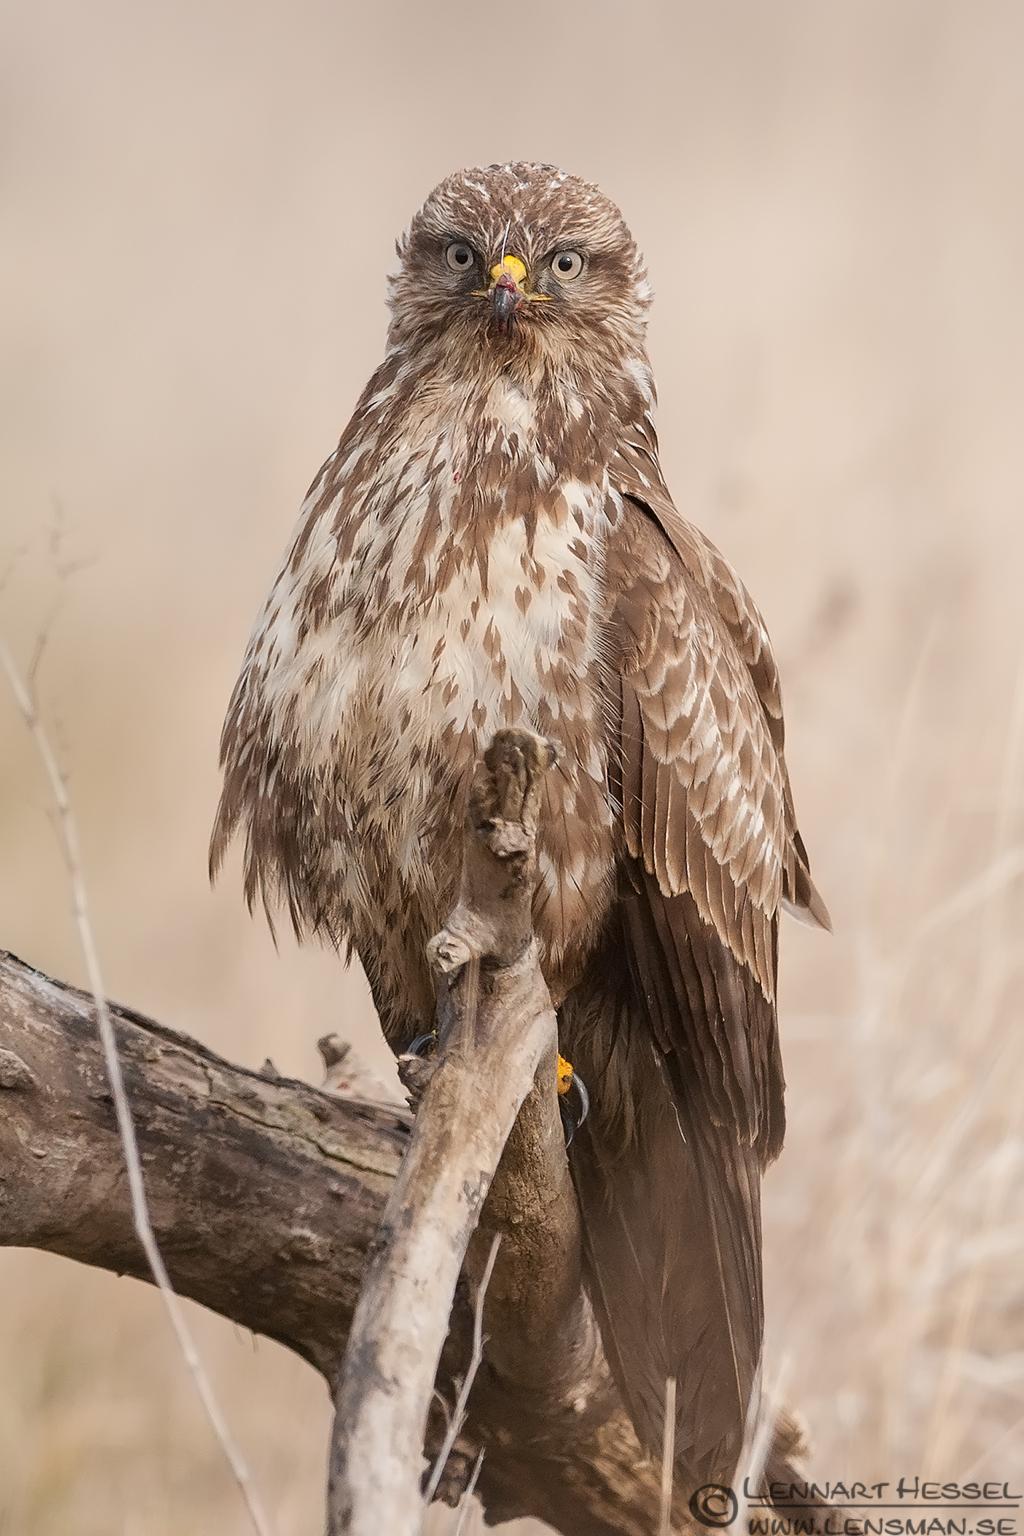 Common Buzzard searching eagle wild bird